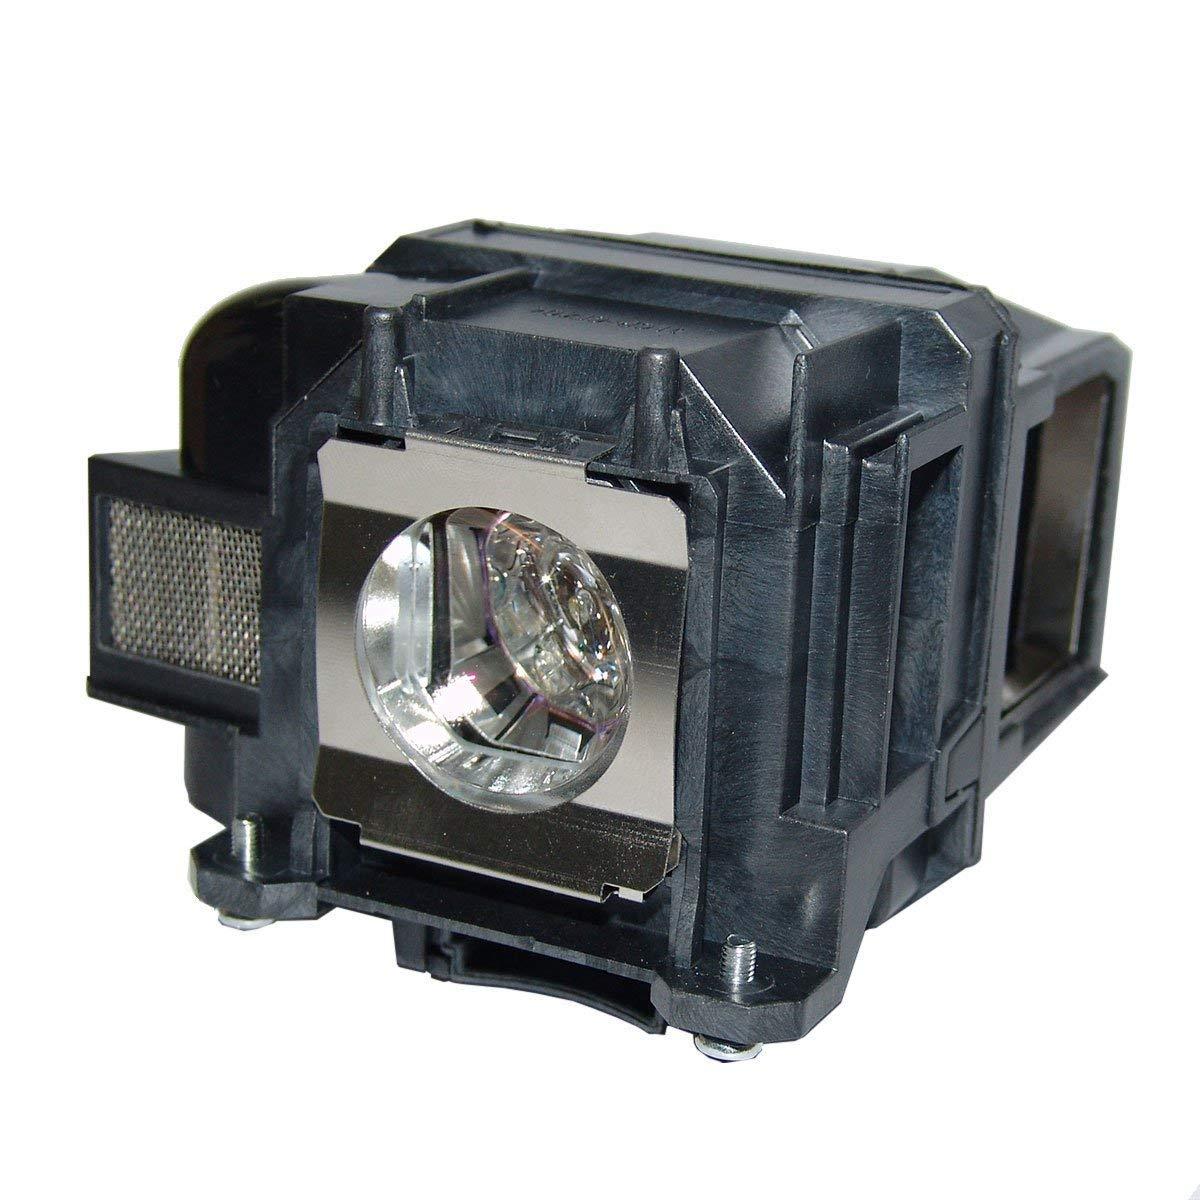 WOWSAI V13H010L78 交換用ランプ ハウジング付き エプソン PowerLite Home Cinema 2030 2000 730HD 725HD 600 VS230 VS330 VS335W EX3220 EX6220 EX7220 EX7230 EX7235 EX5220 EX5230 ELPLP78 プロジェクター用   B07K3VC8H5